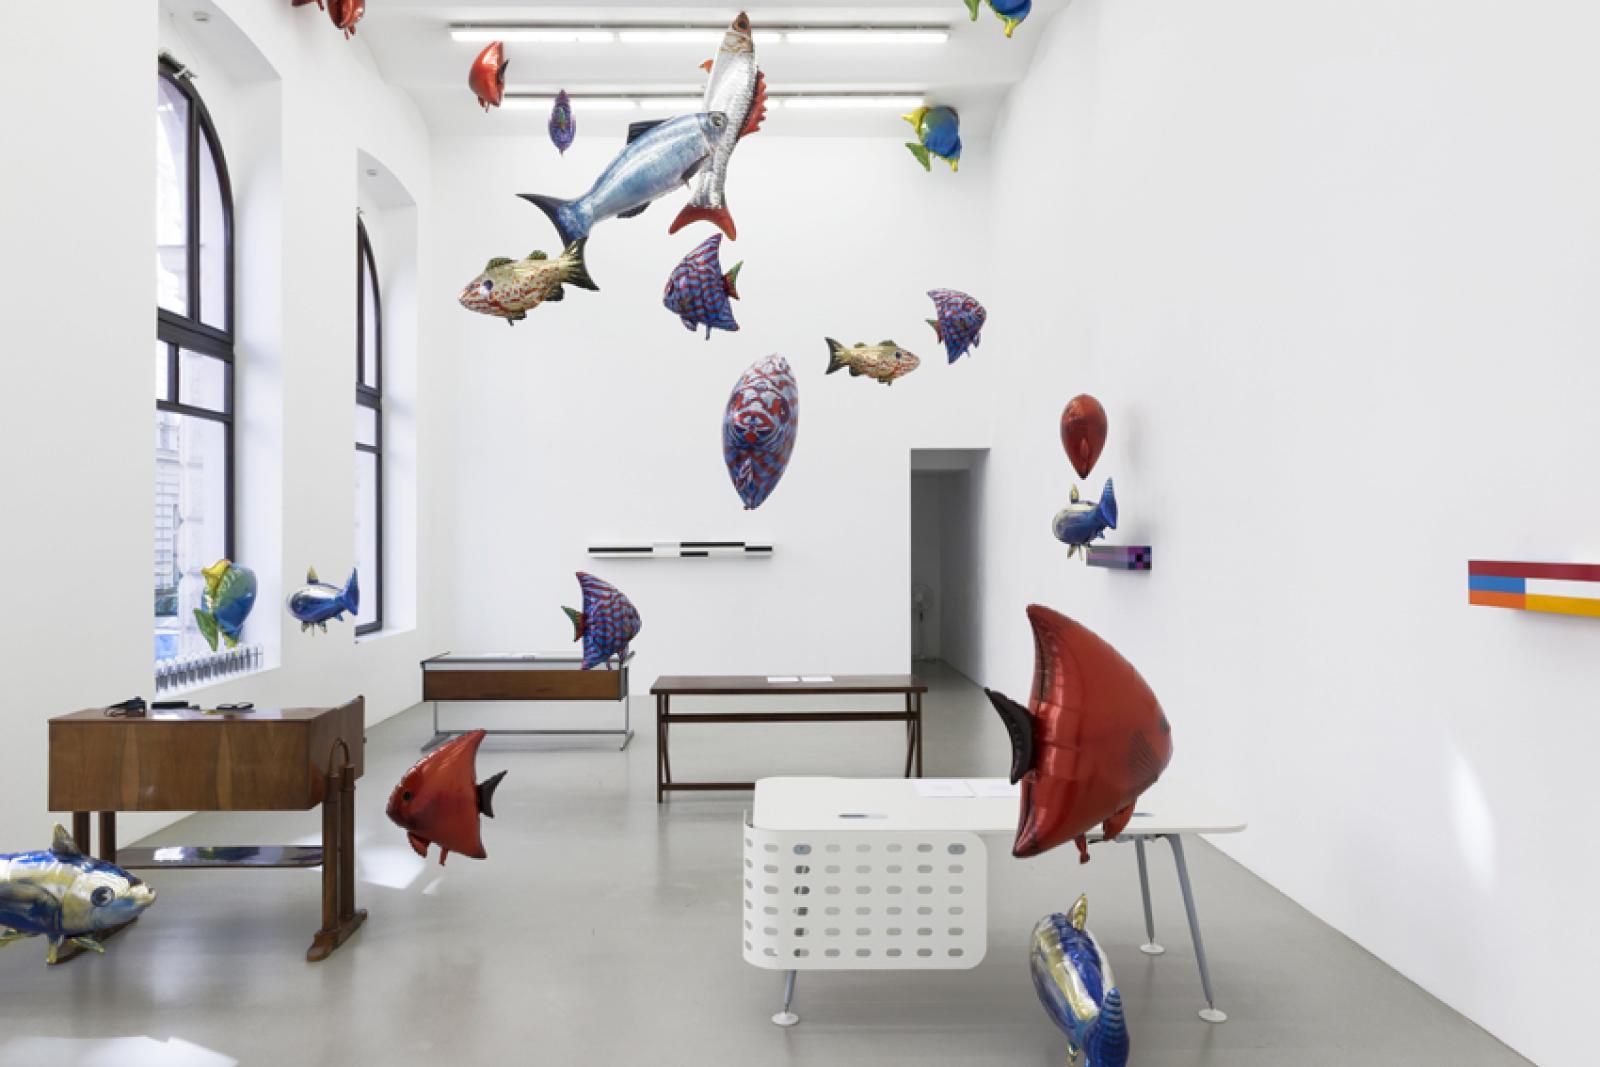 """Schreibtischuhr"" (installation view, 2017) Photo: Marcel Koehler;Courtesy Meyer Kainer, Wien curated by John Rajchman, artists selected by Liam Gillick,Galerie Meyer  Kainer"